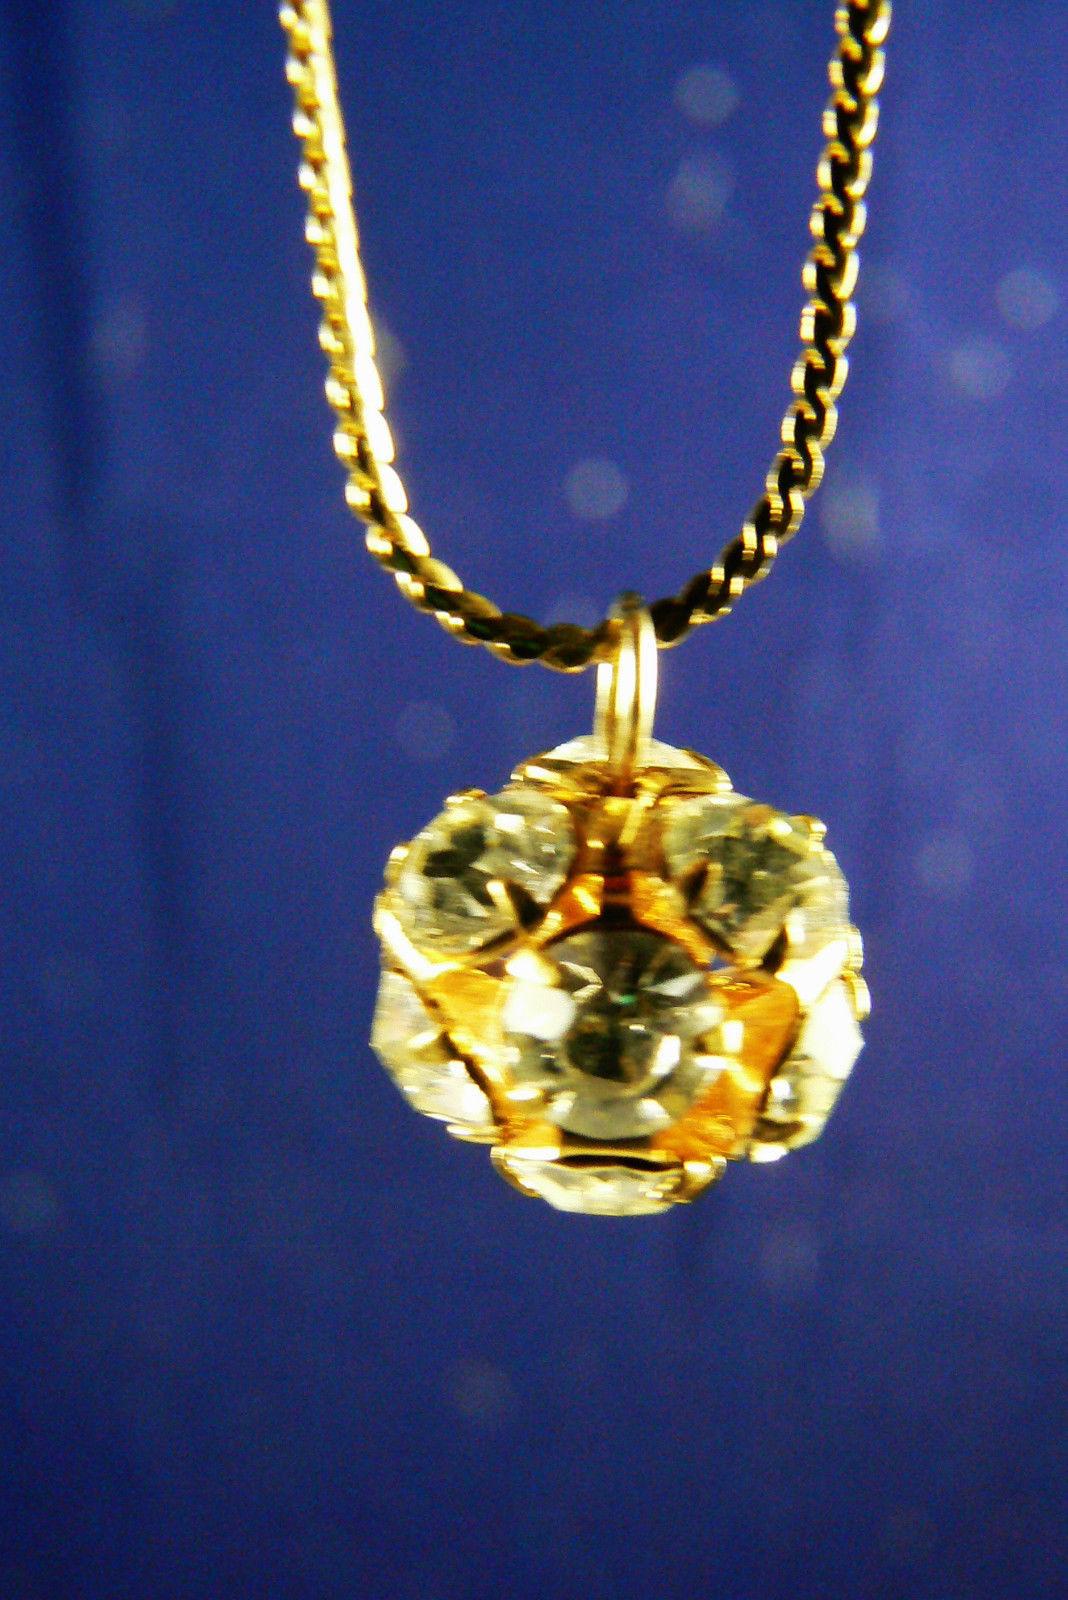 gold tone metal sphere drop pendant chain